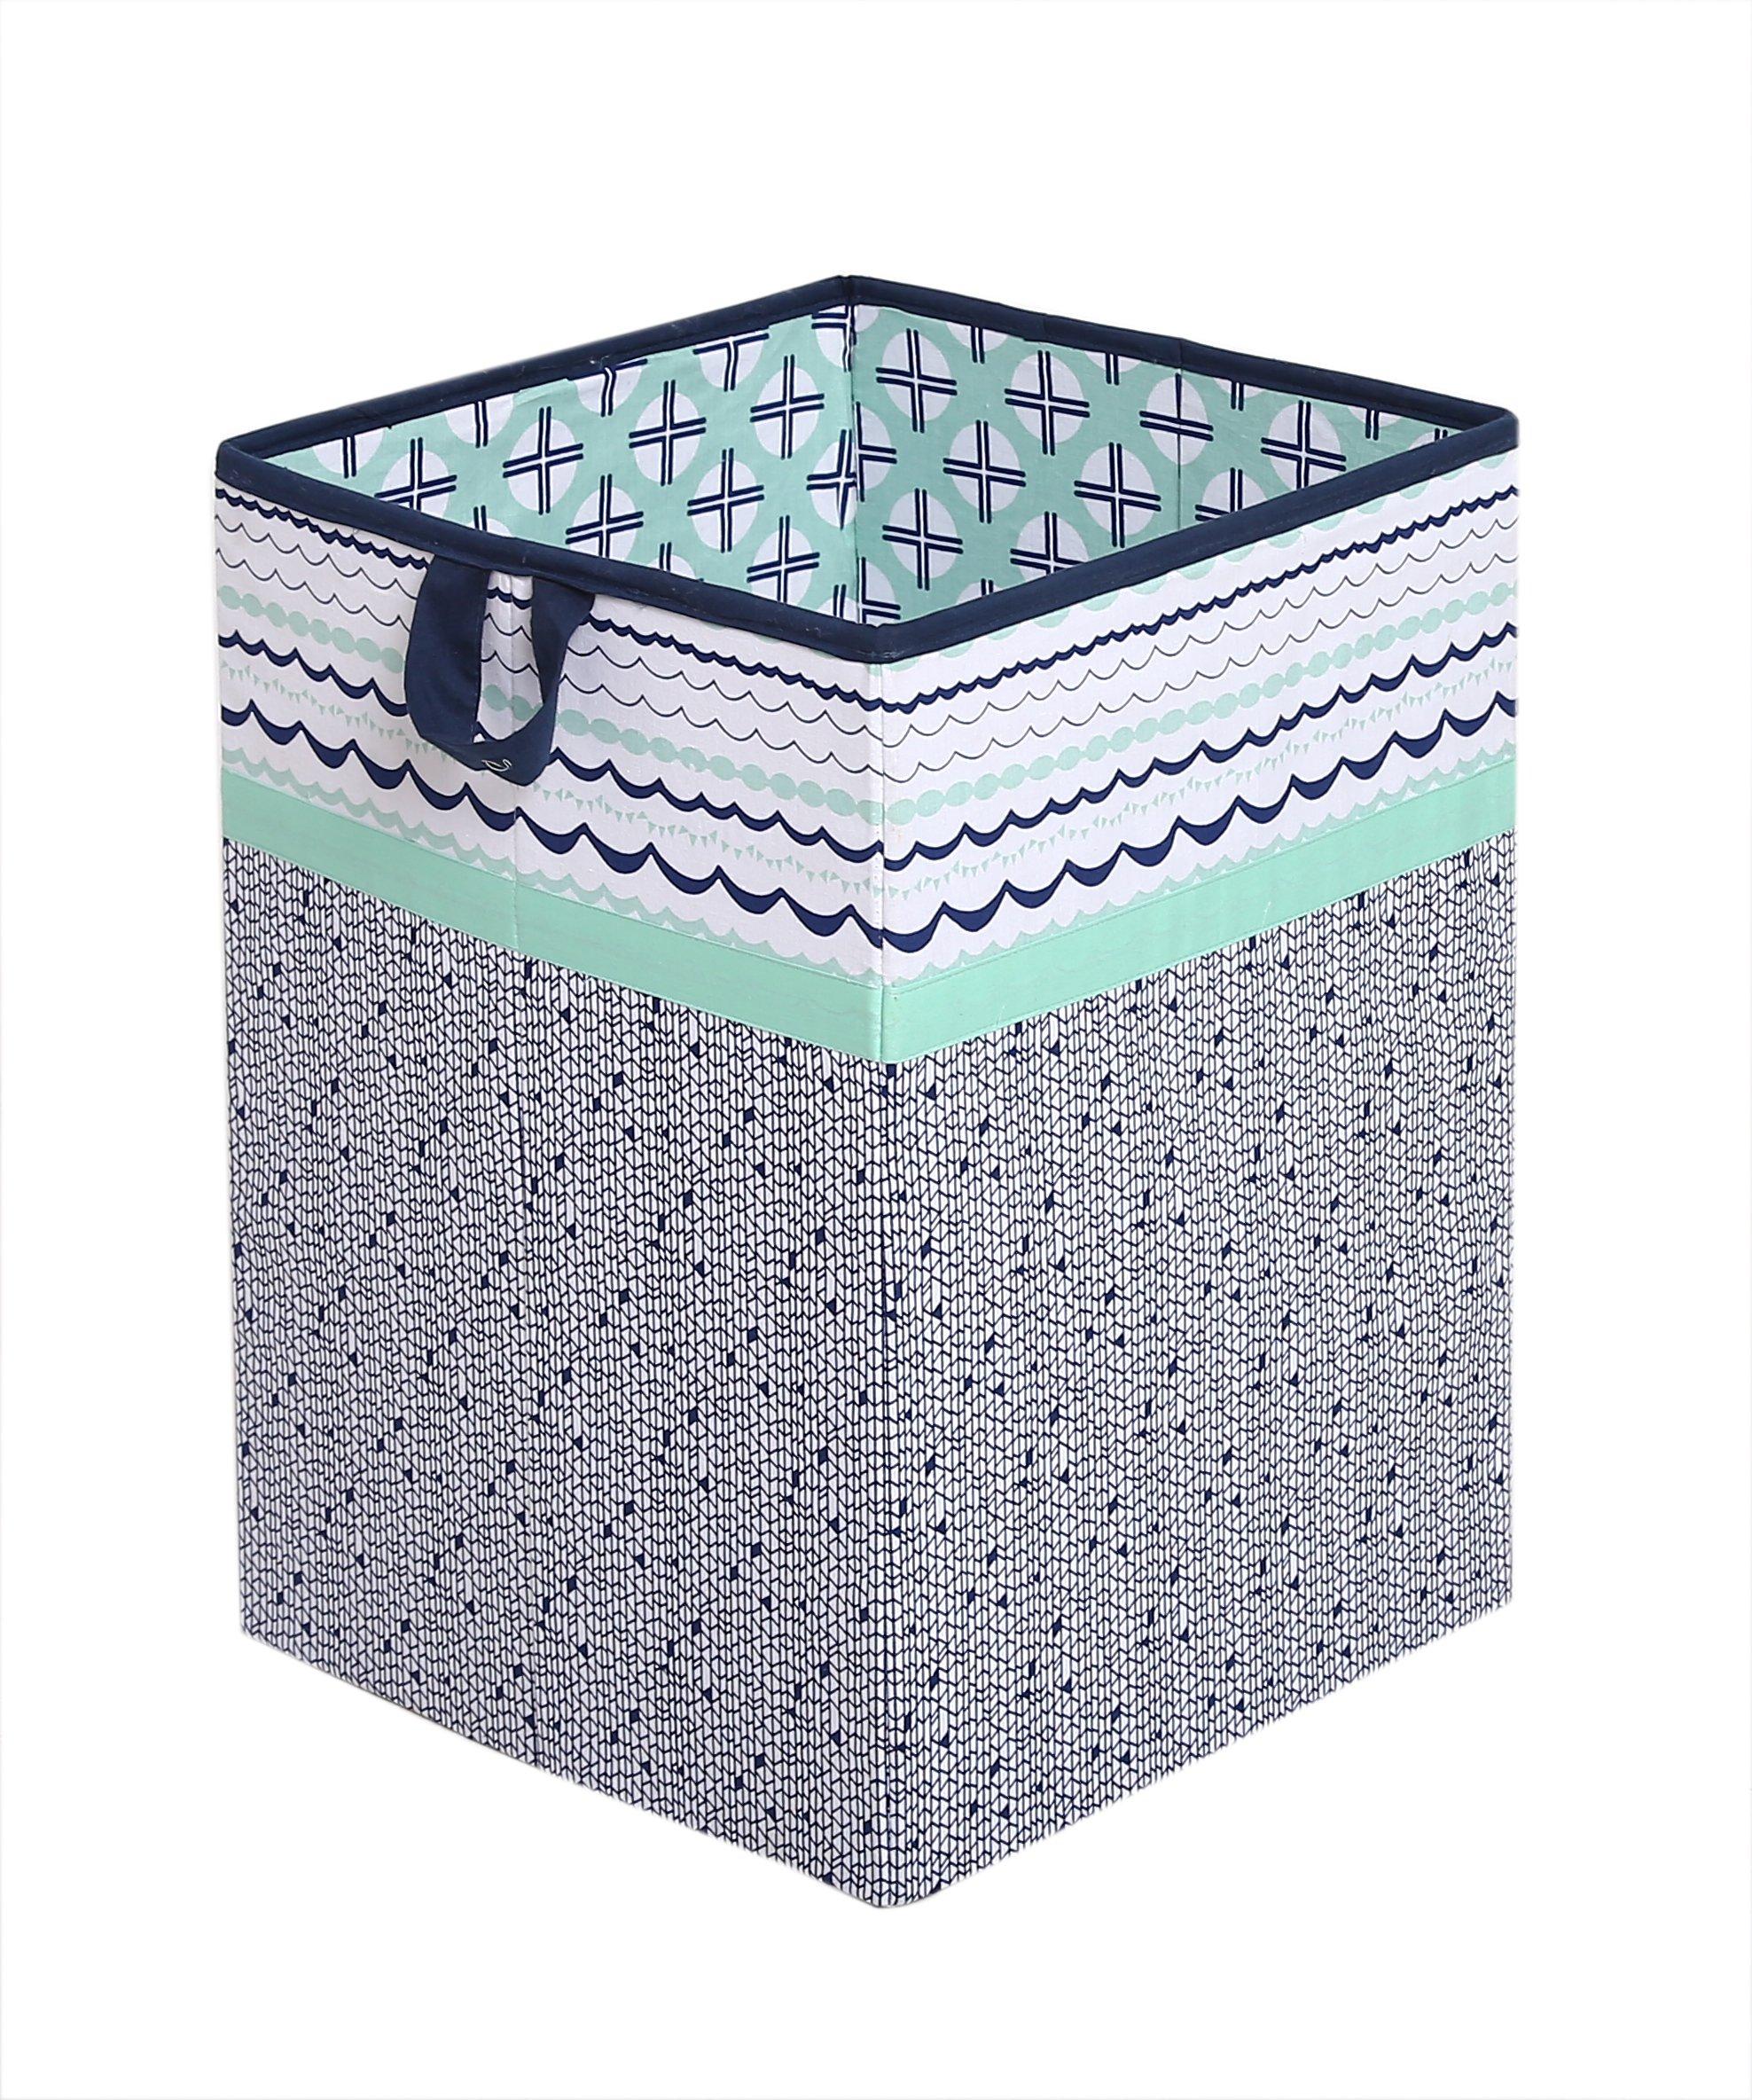 Tribal/Aztec Kids Storage (Hamper 14 x 14 x 19 inches, Mint/Navy)